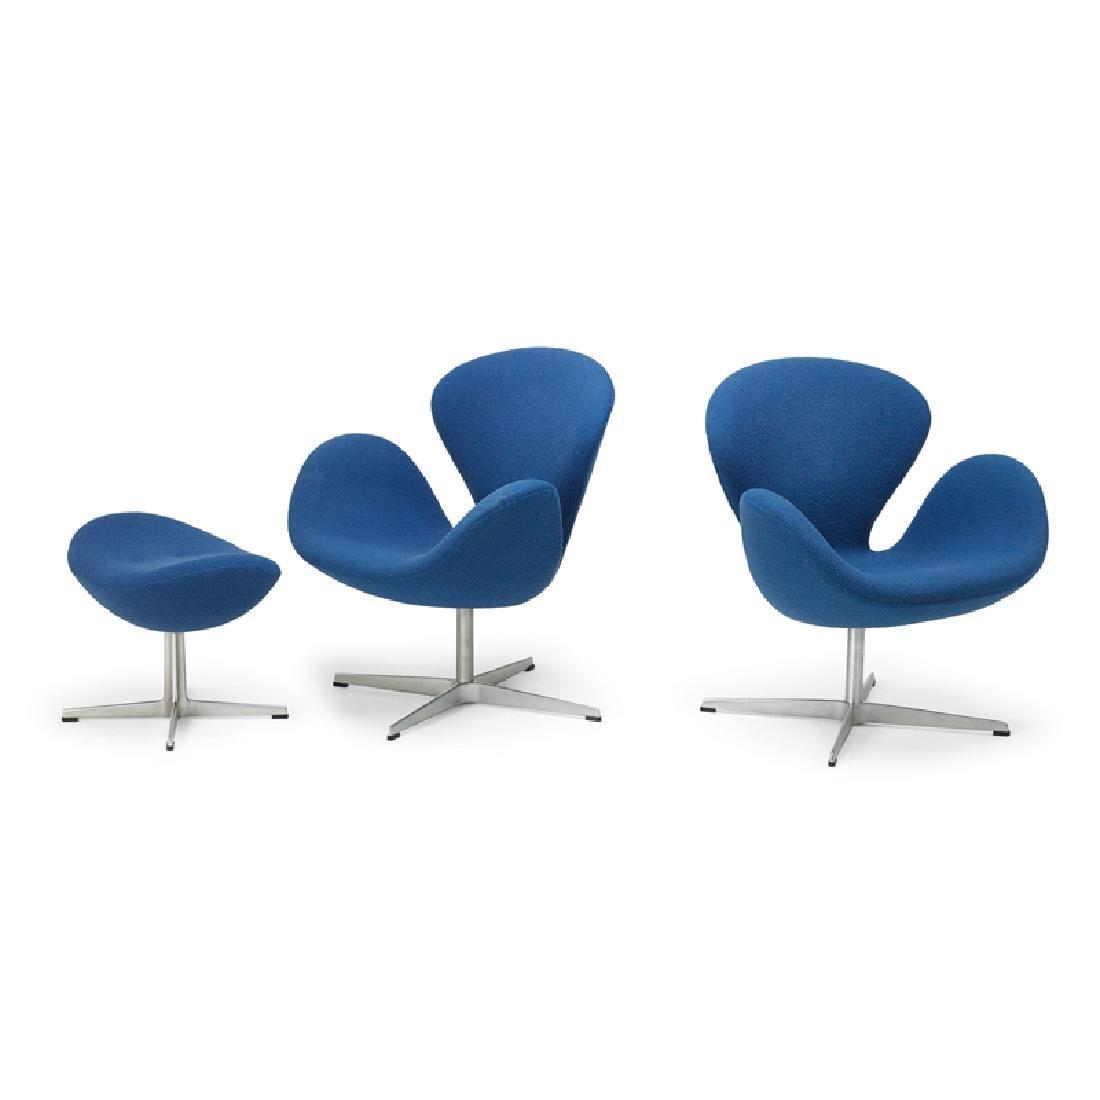 ARNE JACOBSEN Pair of Swan chairs, ottoman